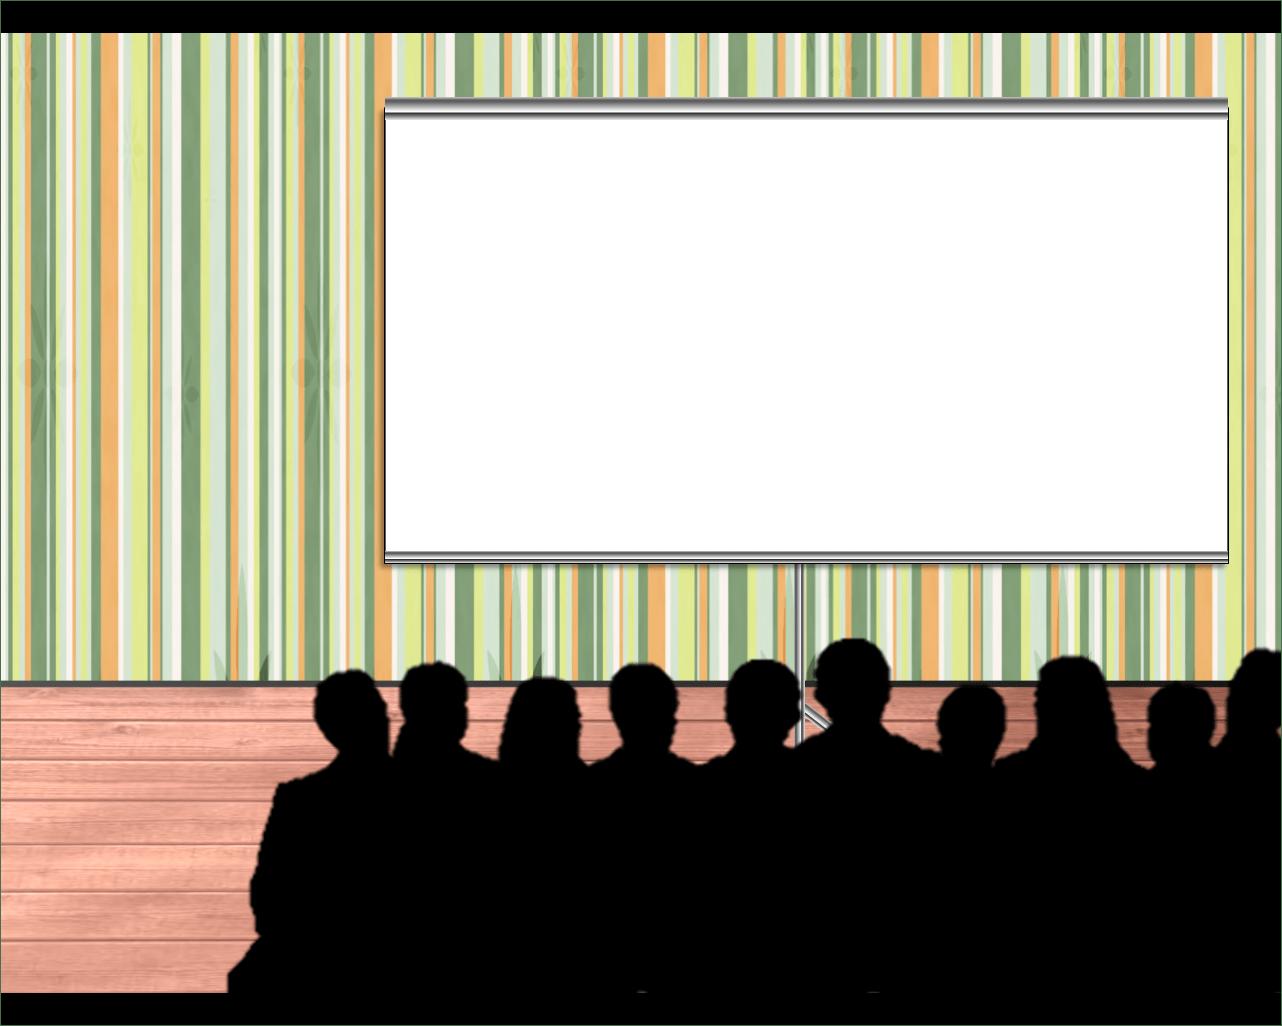 training seminar template - HD1282×1026